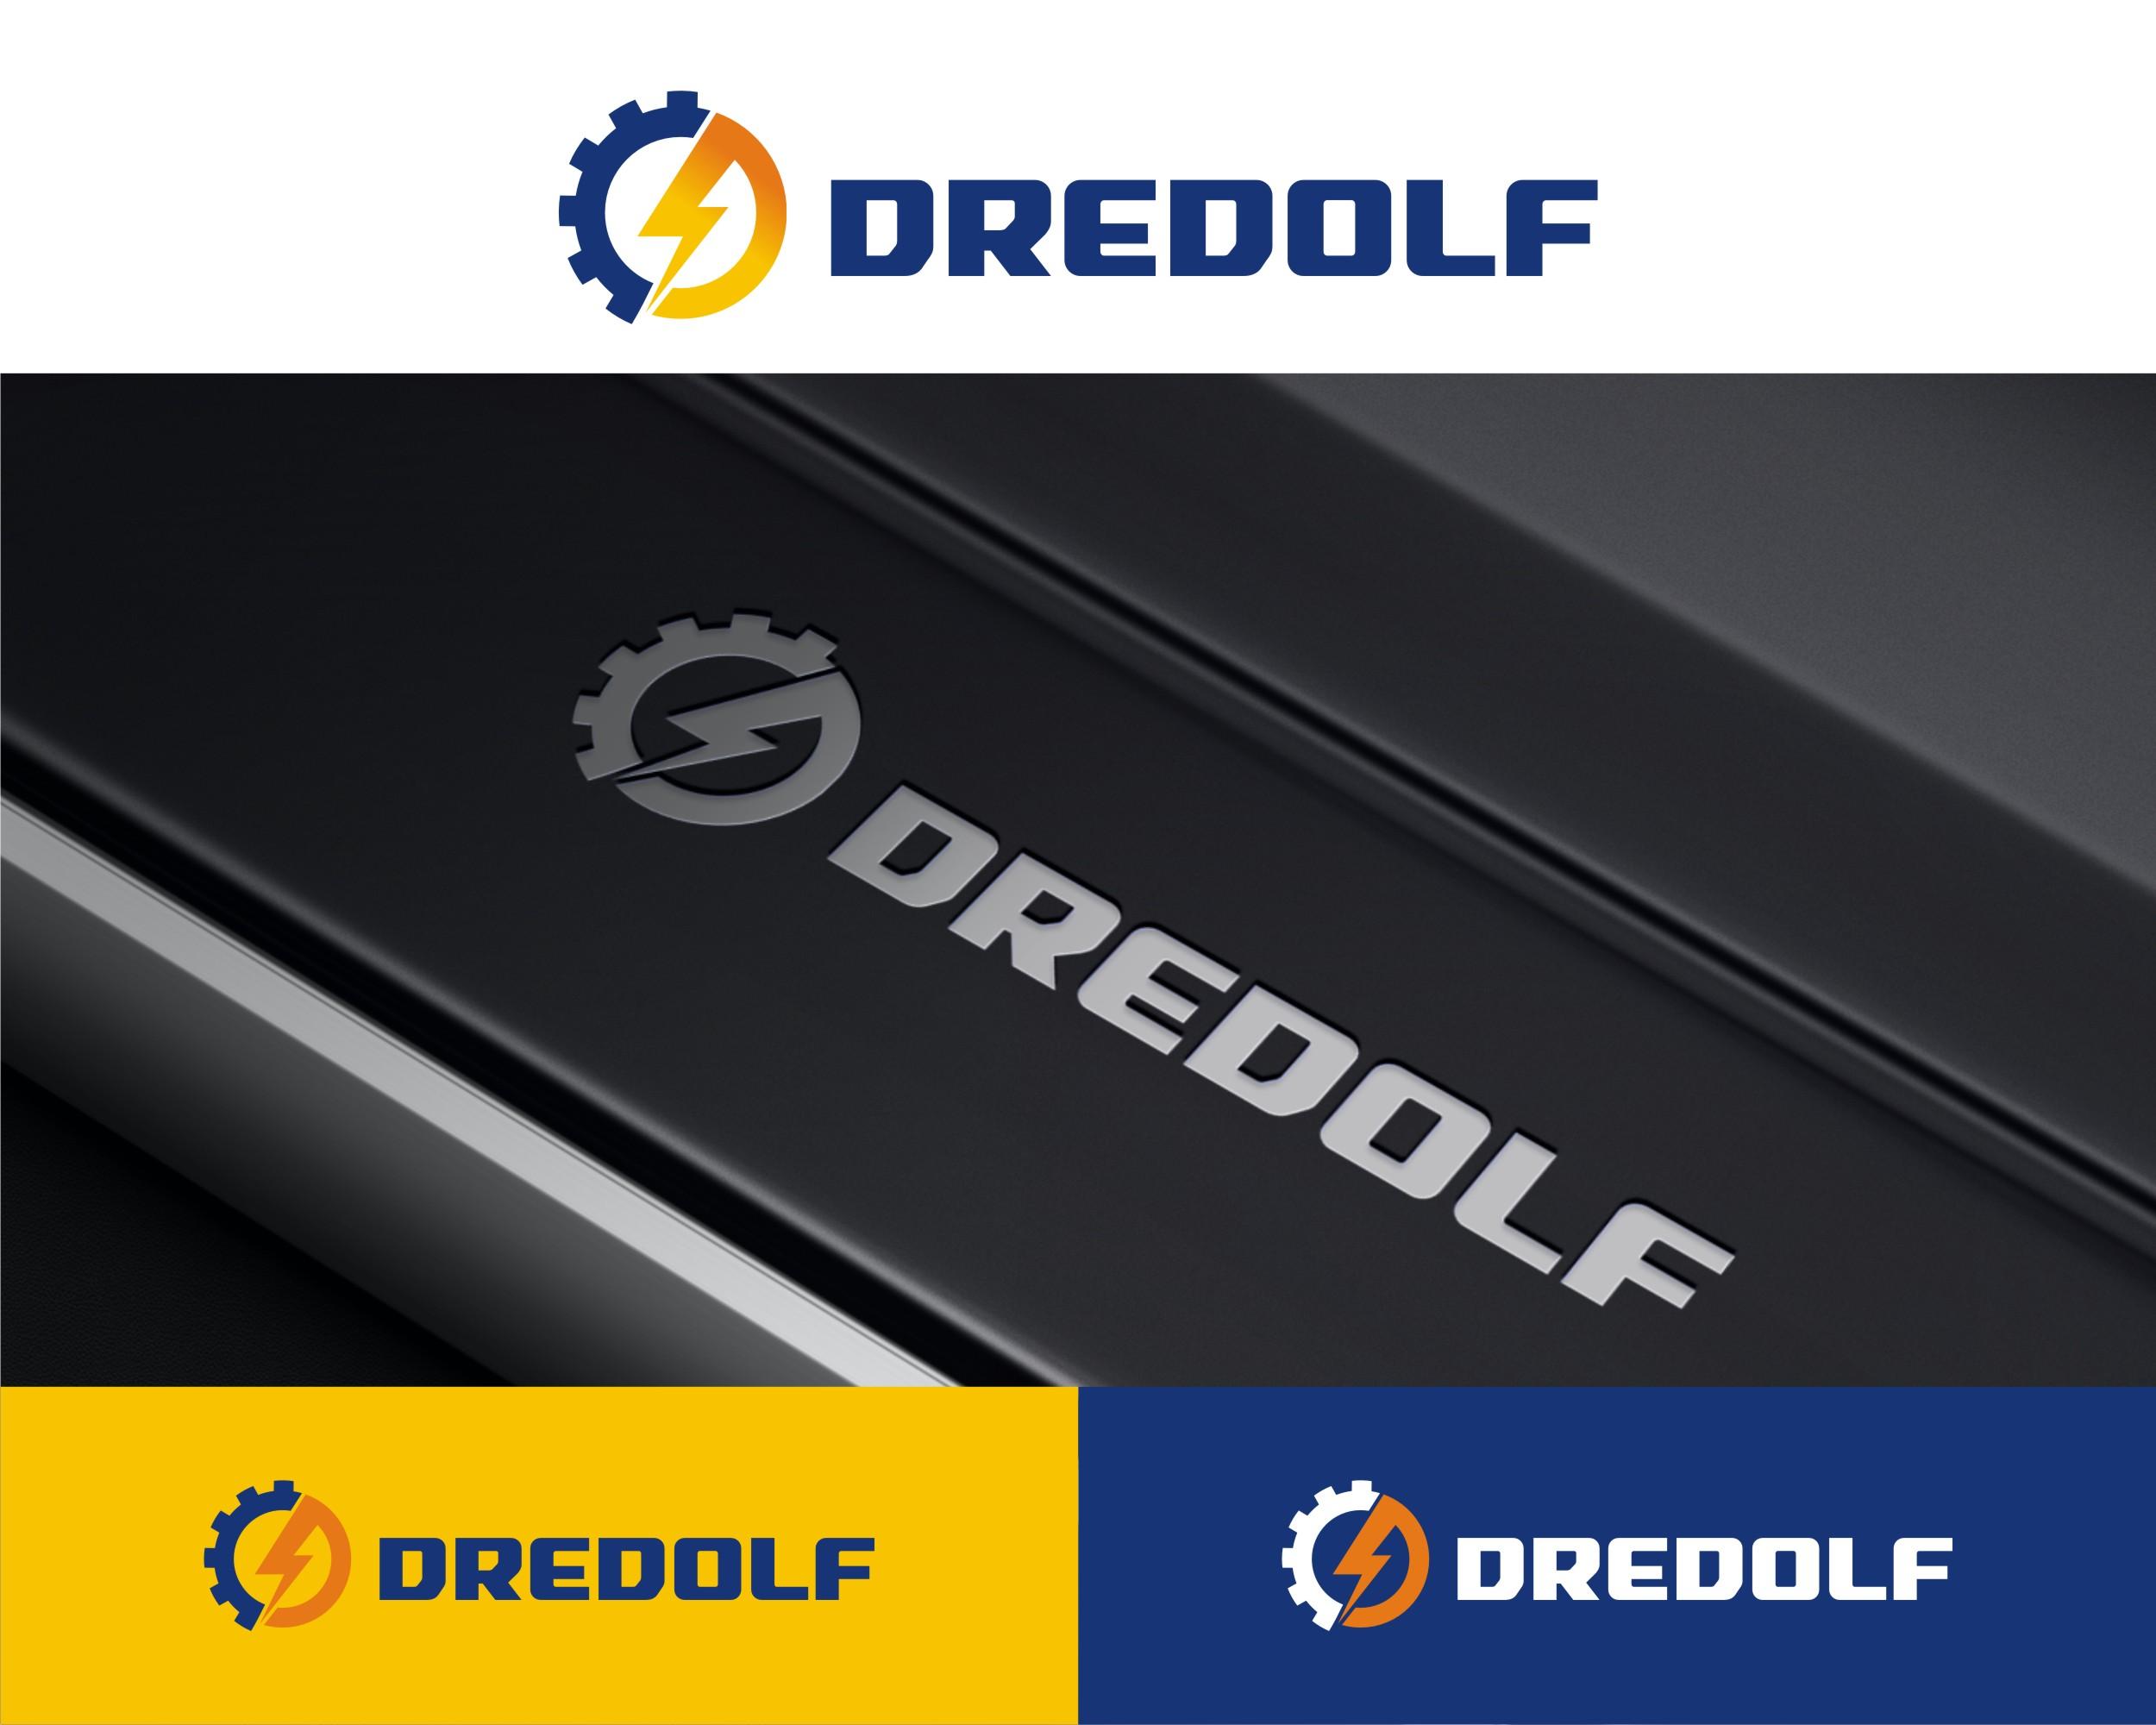 Dd55120262